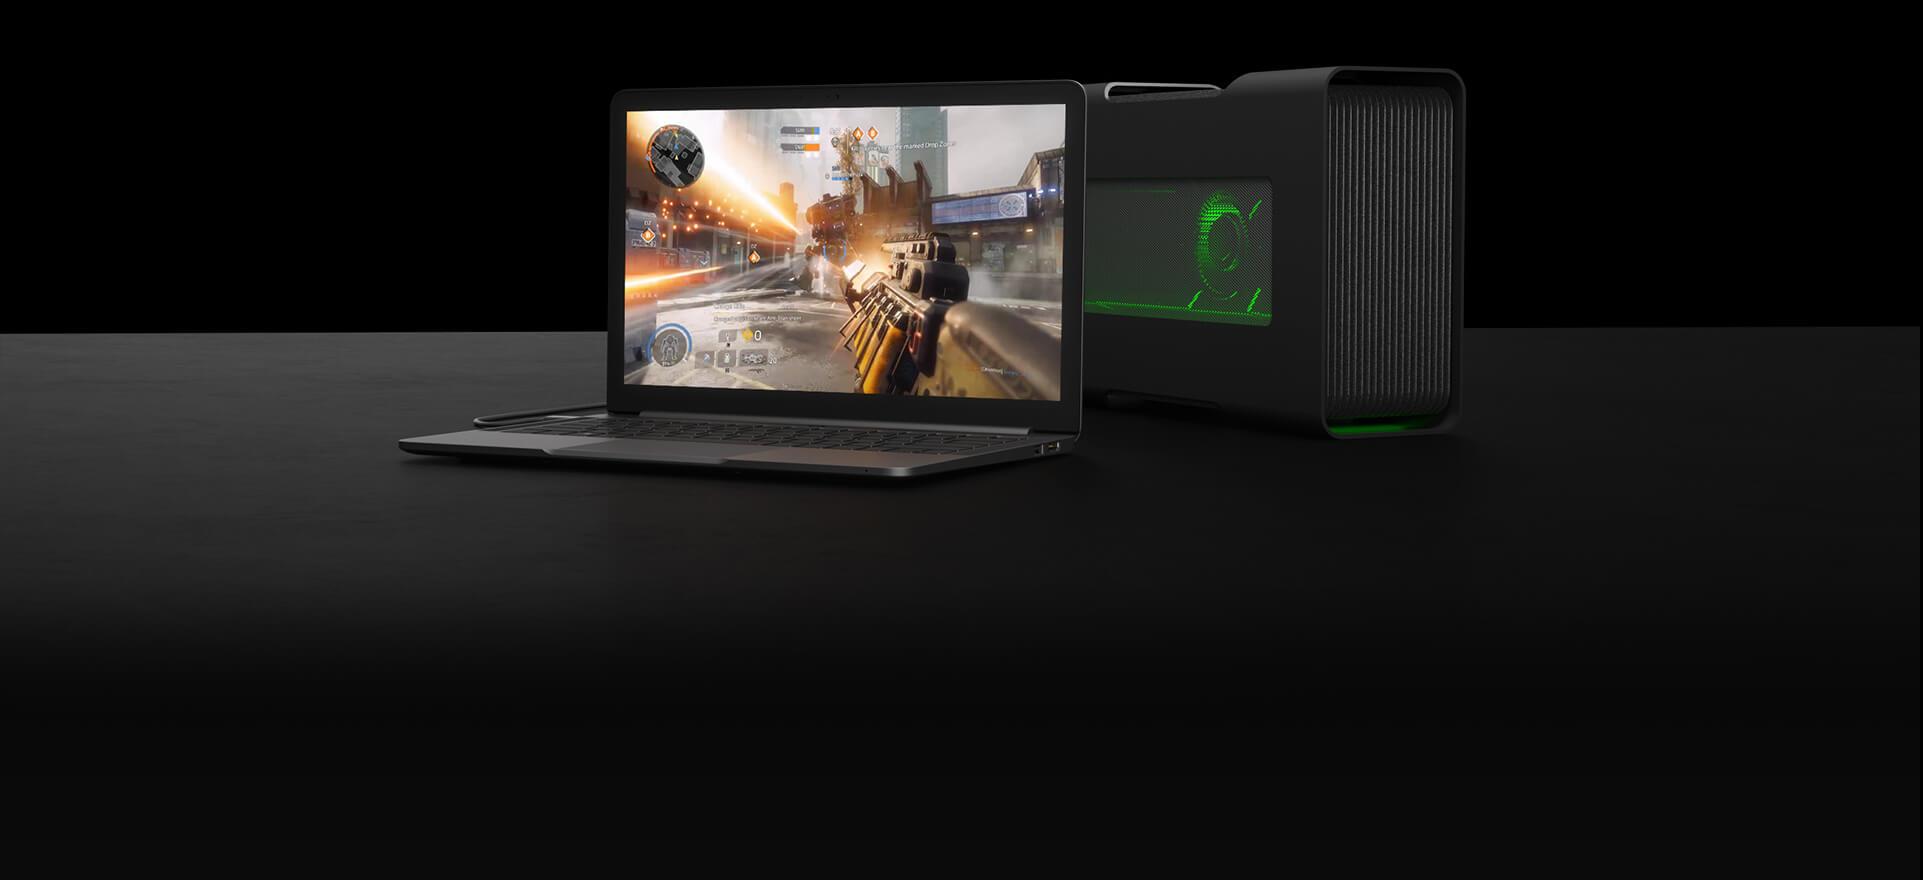 Ultrabook Laptop The New Razer Blade Stealth